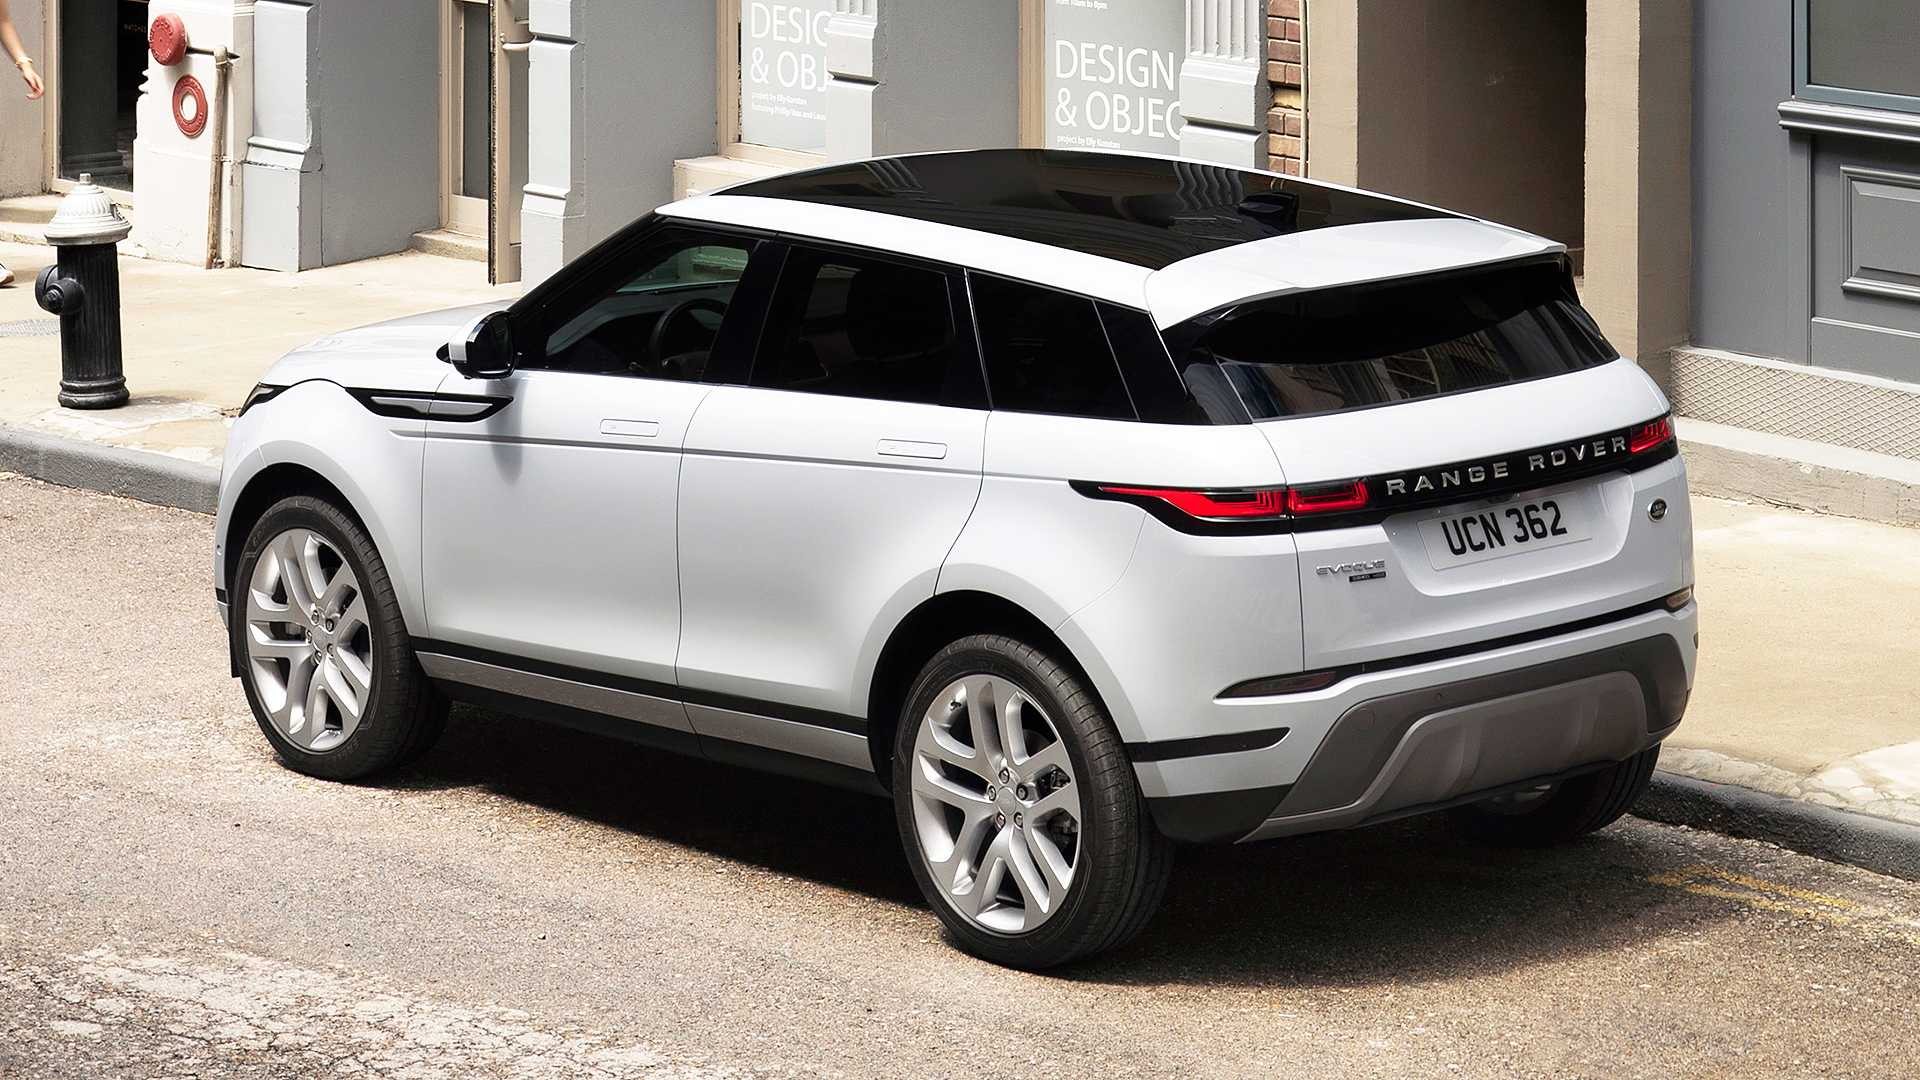 2020-range-rover-evoque (69)